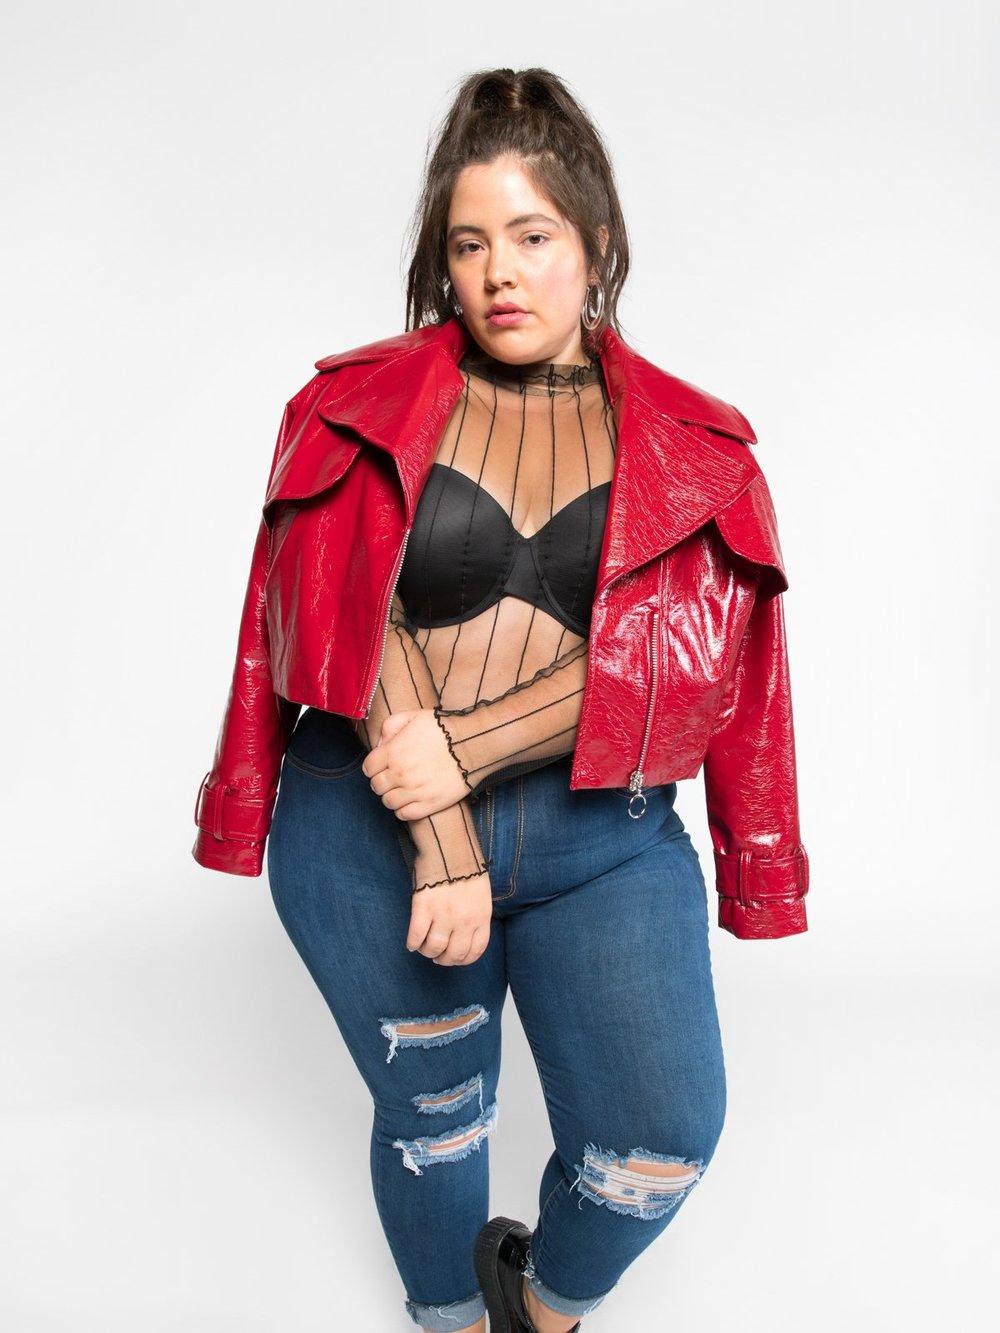 Alicia Vegan Moto Jacket   –    $109.00